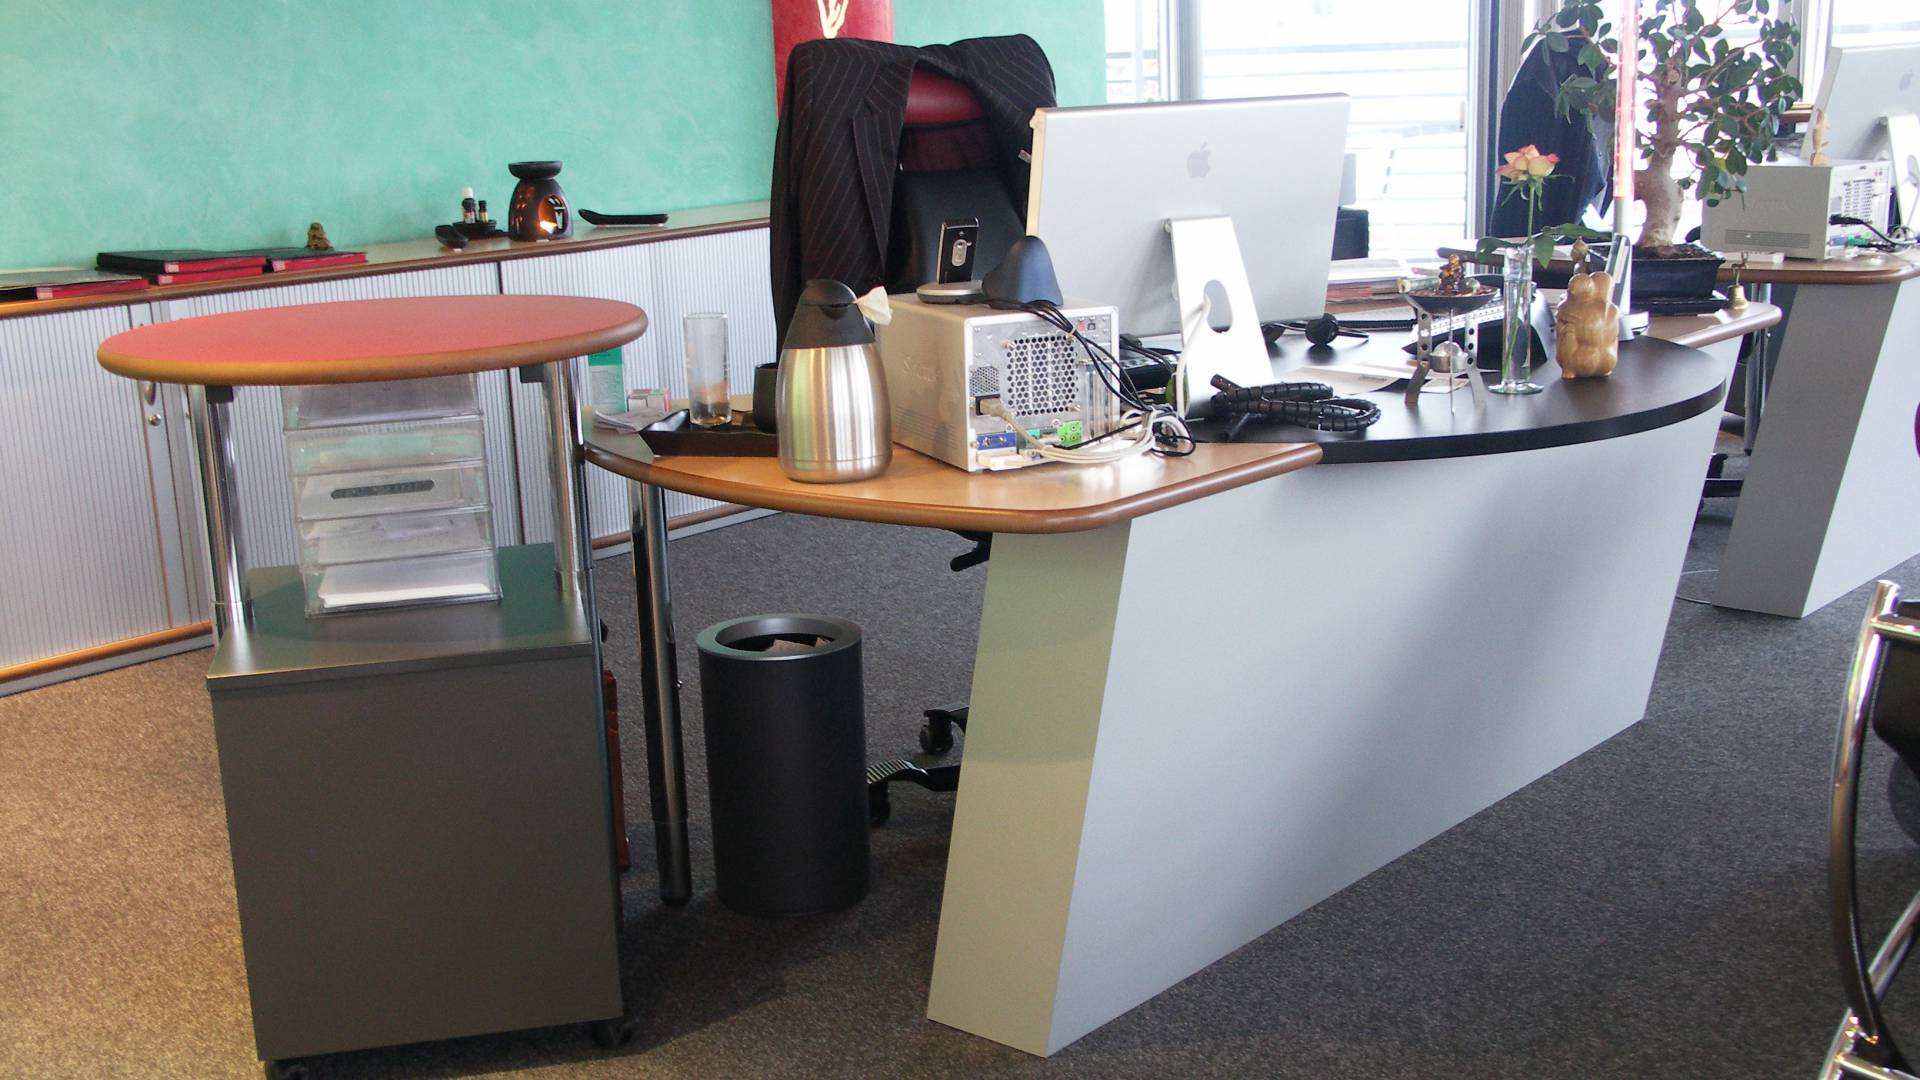 circon 行政命令-行政办公桌-2 circon 命令在一行中